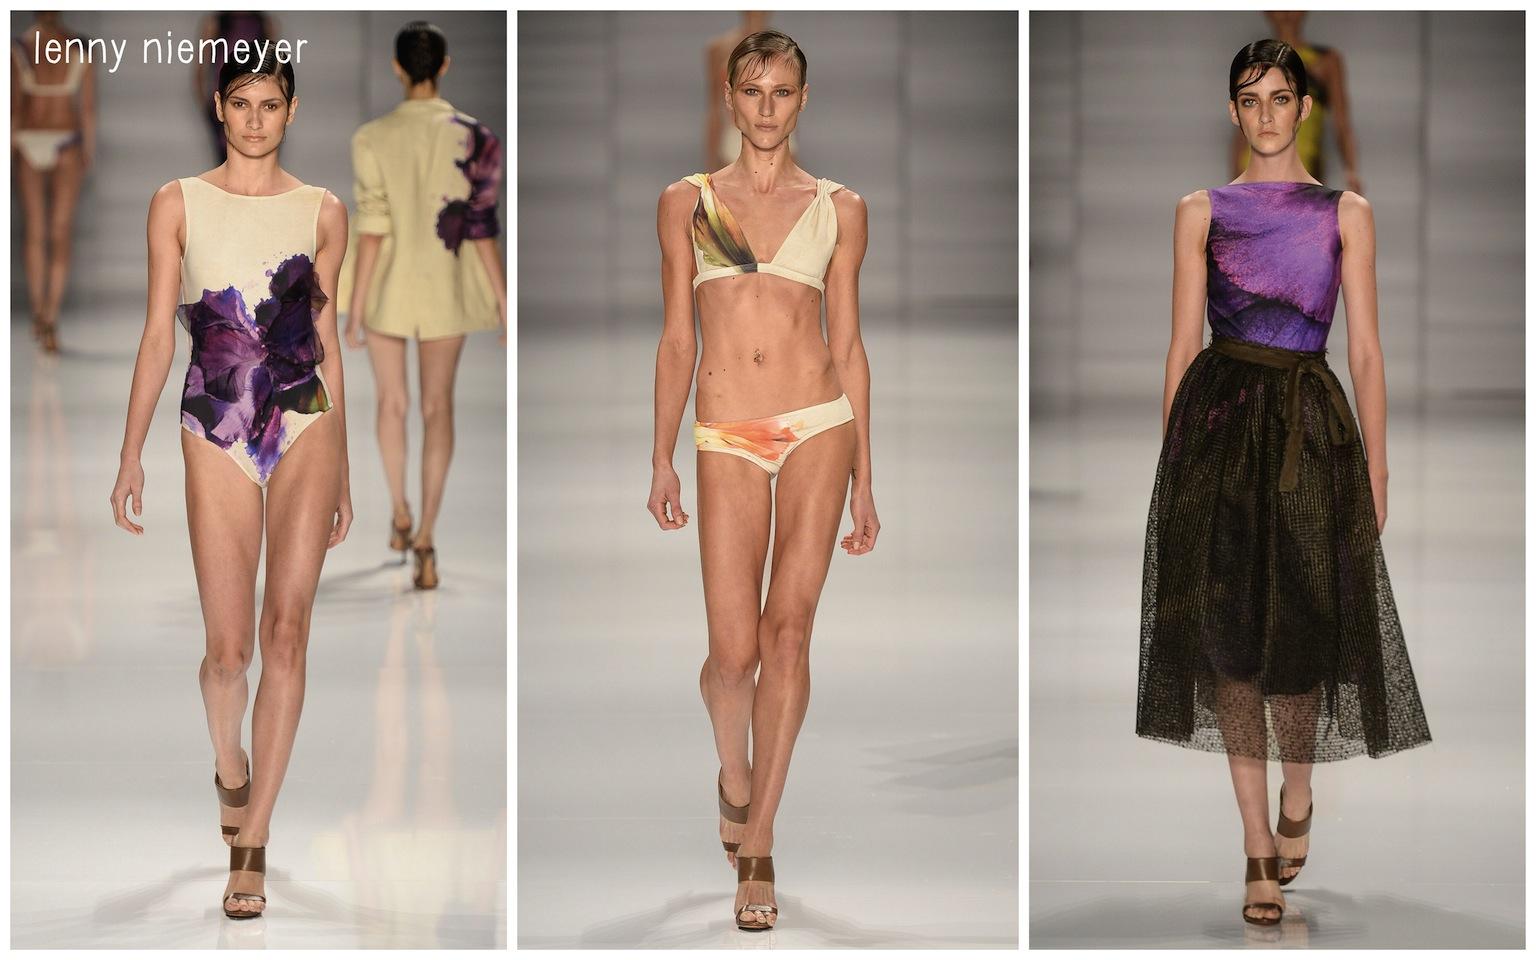 lenny niemeyer fashion rio verao 2015